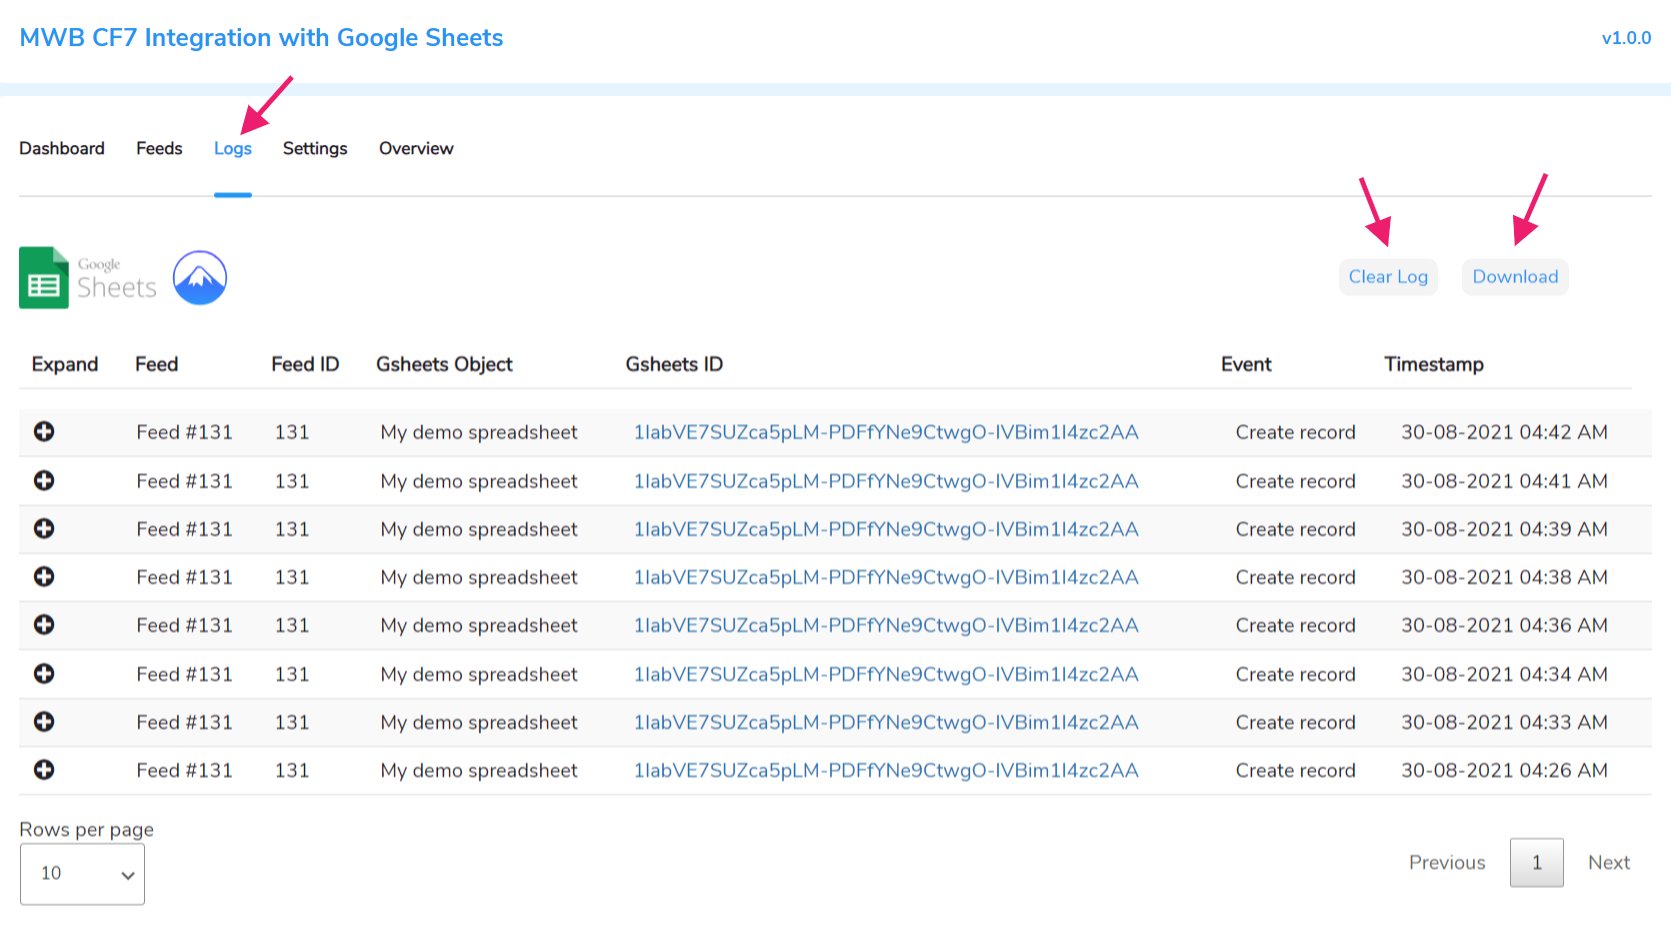 cf7 integration with google sheet